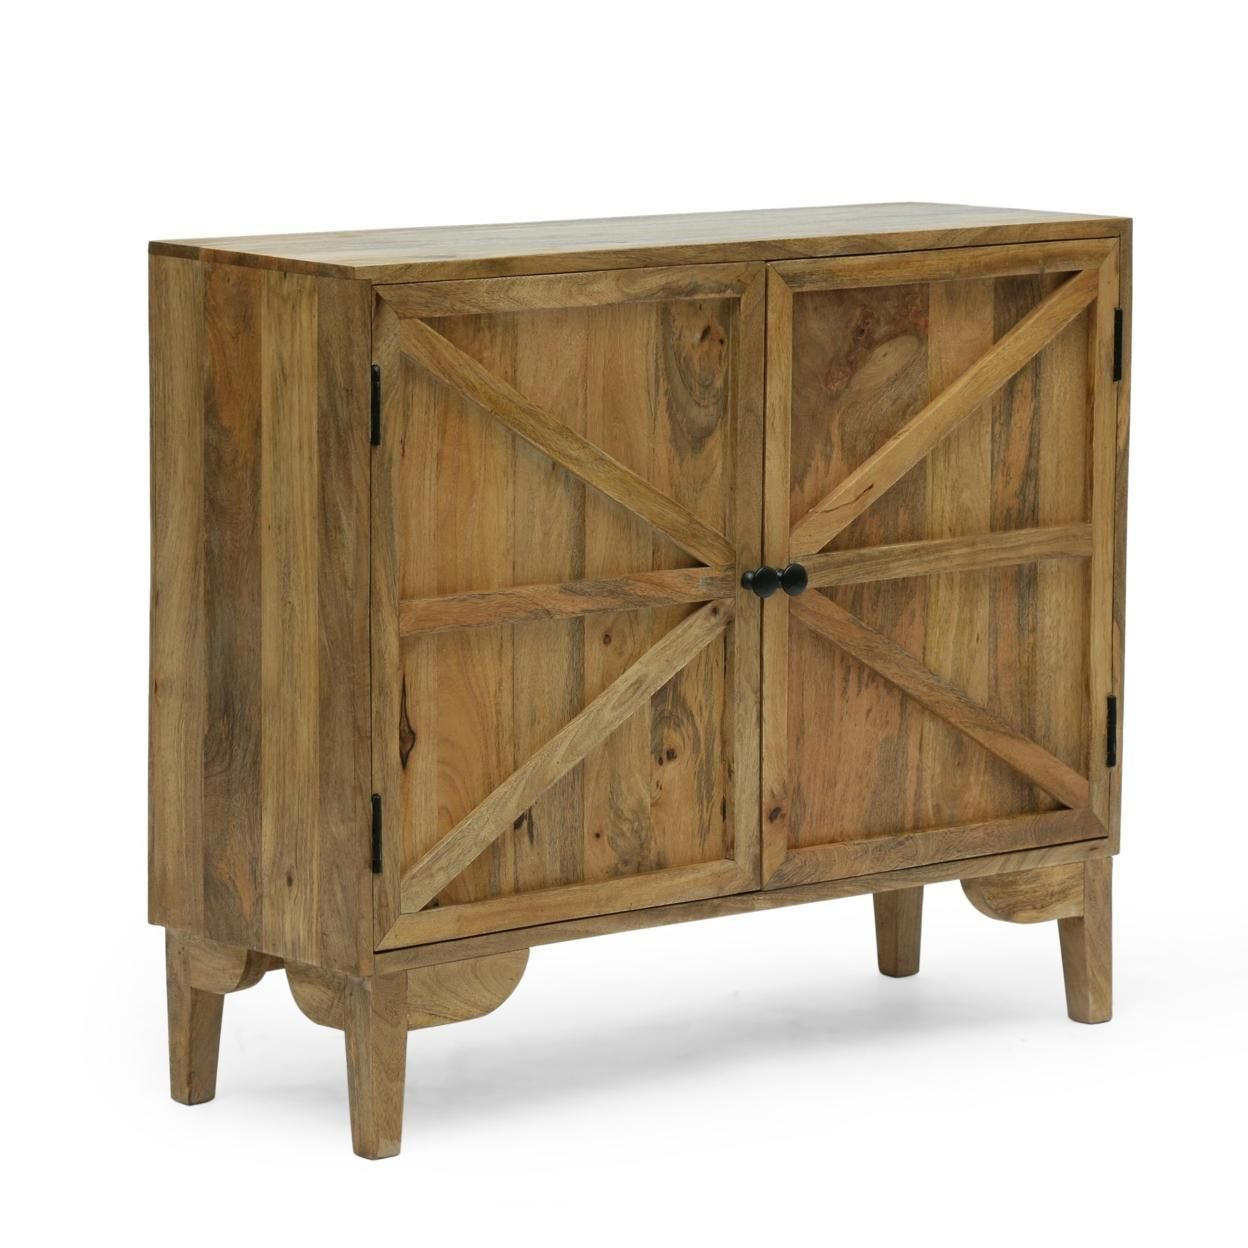 Teton Farmhouse Handcrafted Mango Wood 2 Door Cabinet, Natural